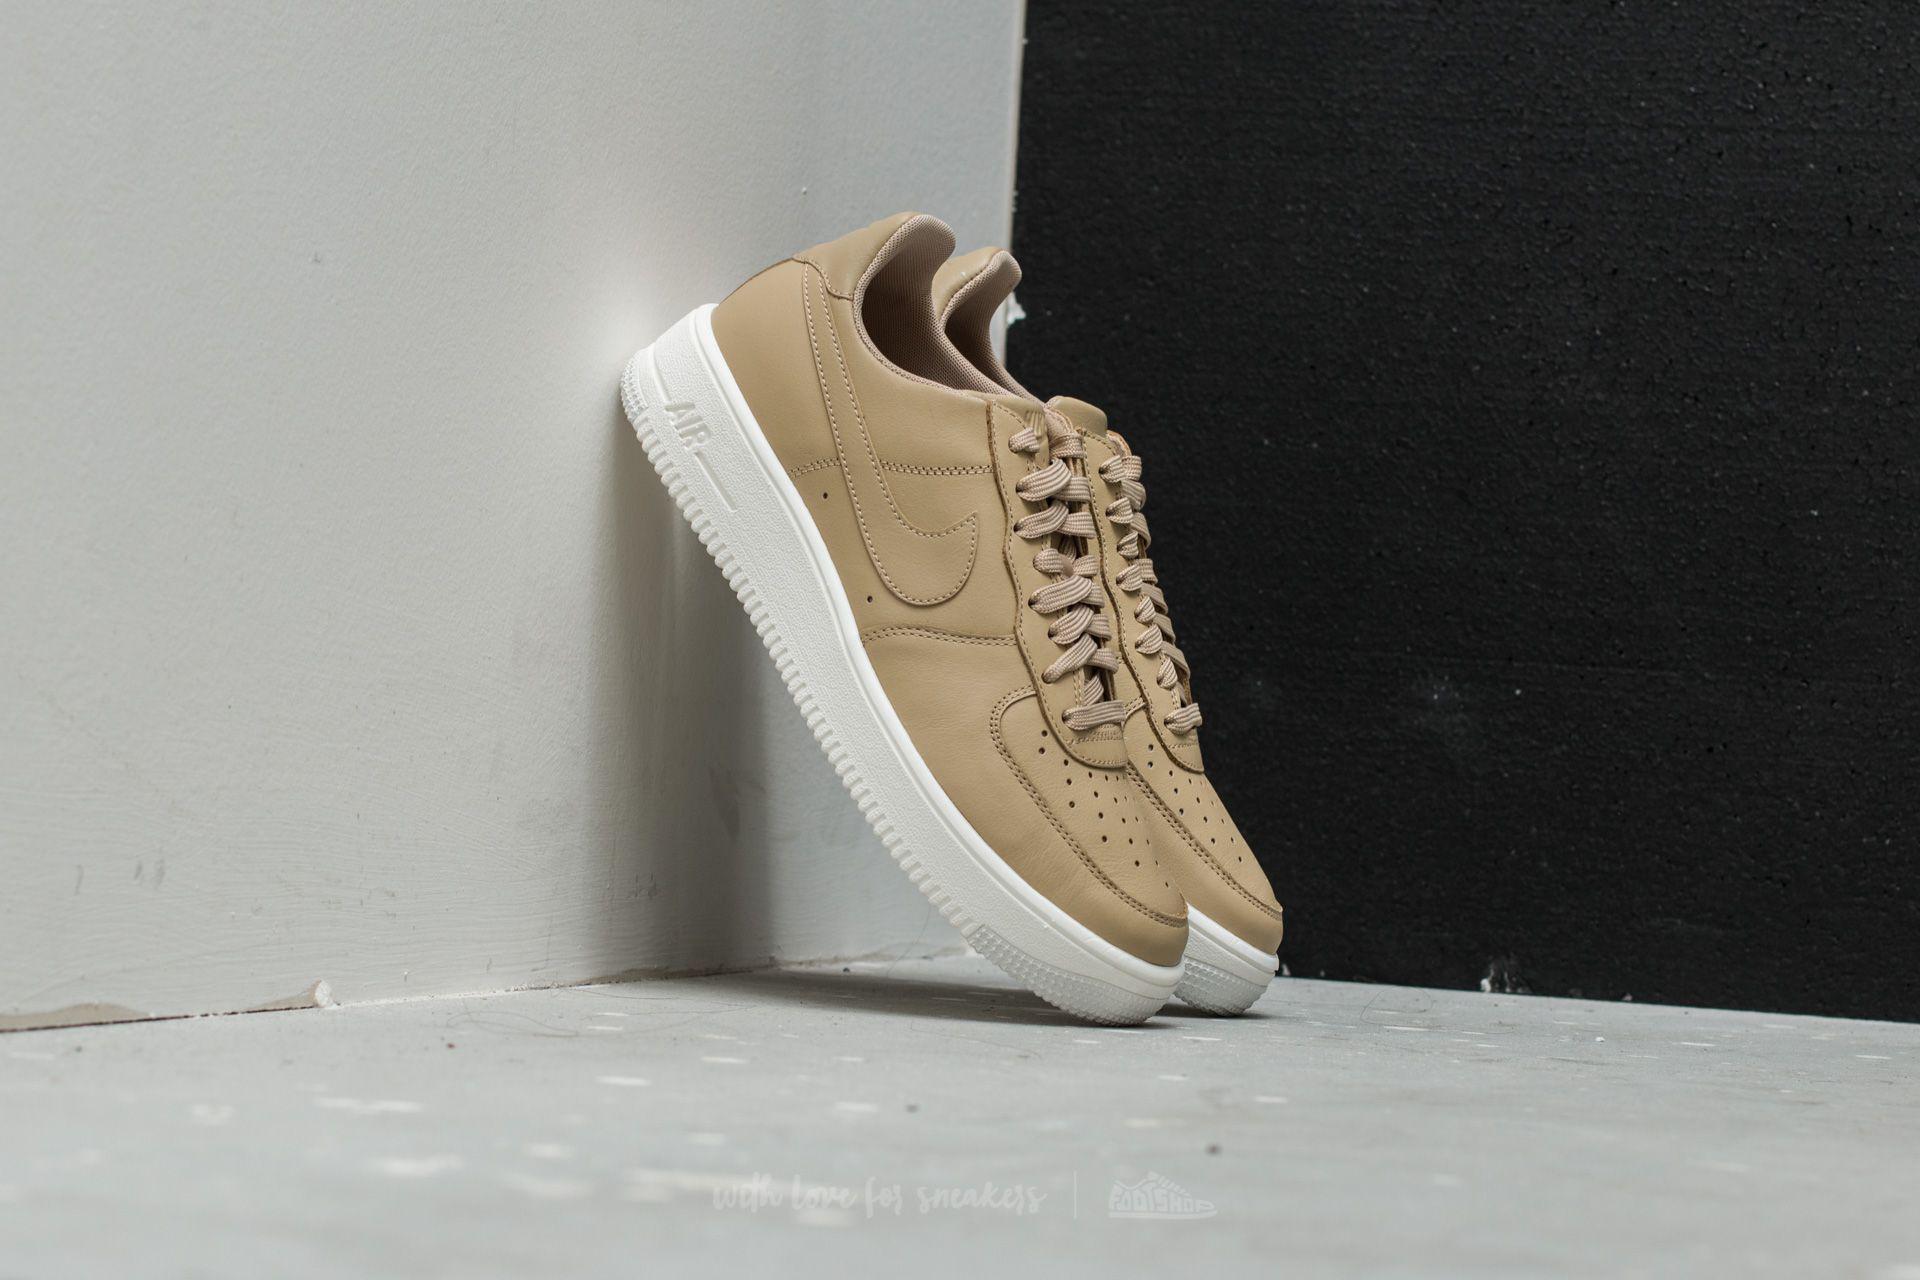 khaki air force 1 leather